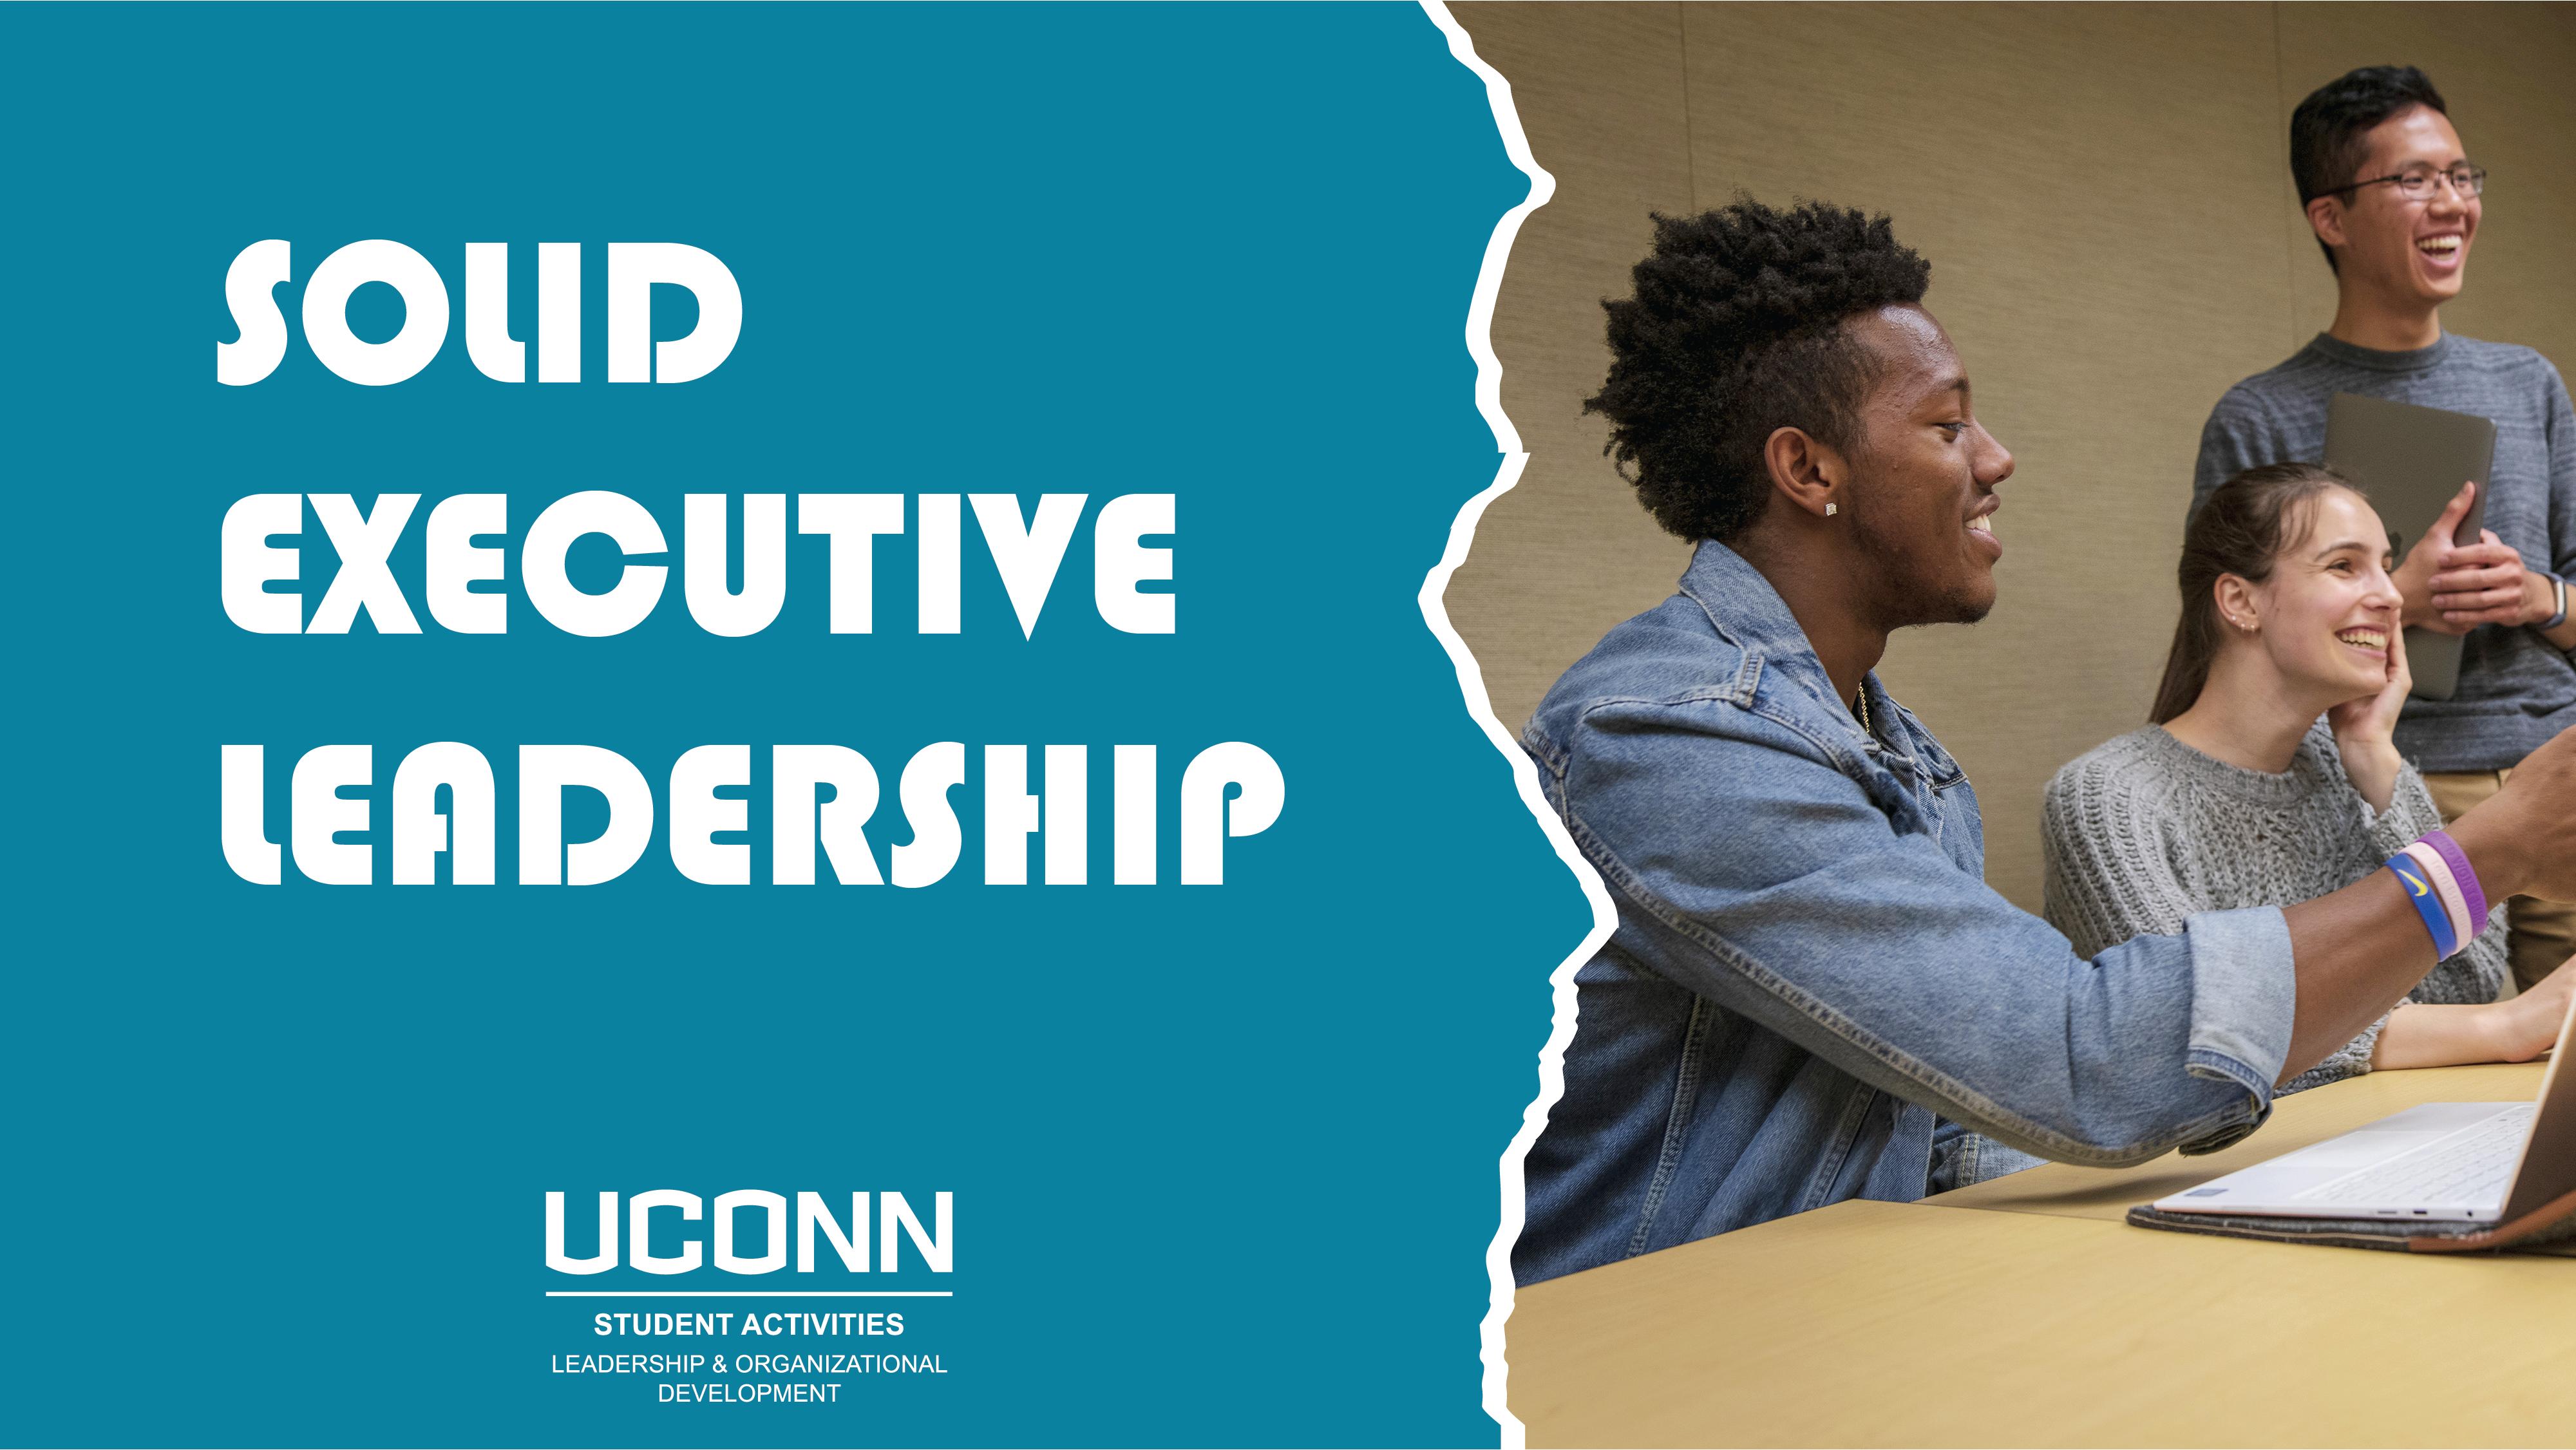 SOLID Executive Leadership Workshop